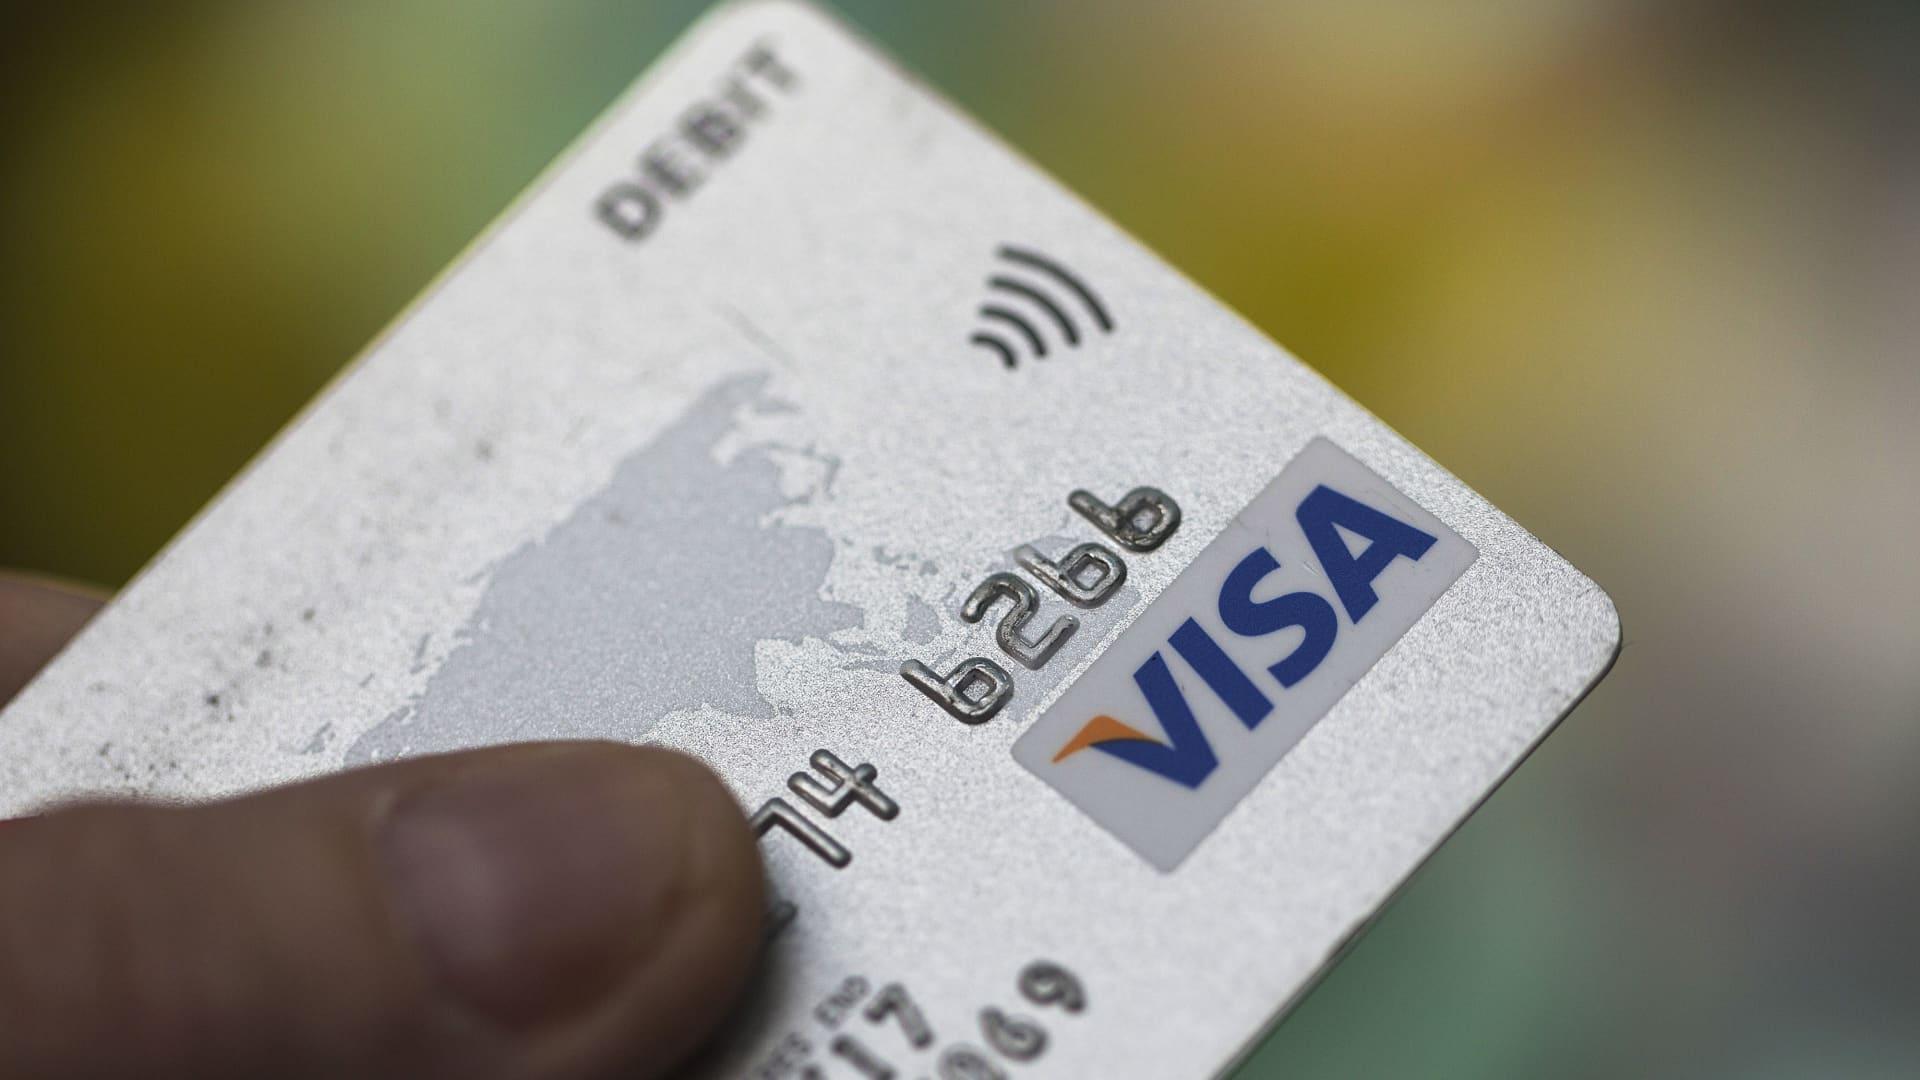 Visa To Offer Safe And Secure Digital Payments At NFL